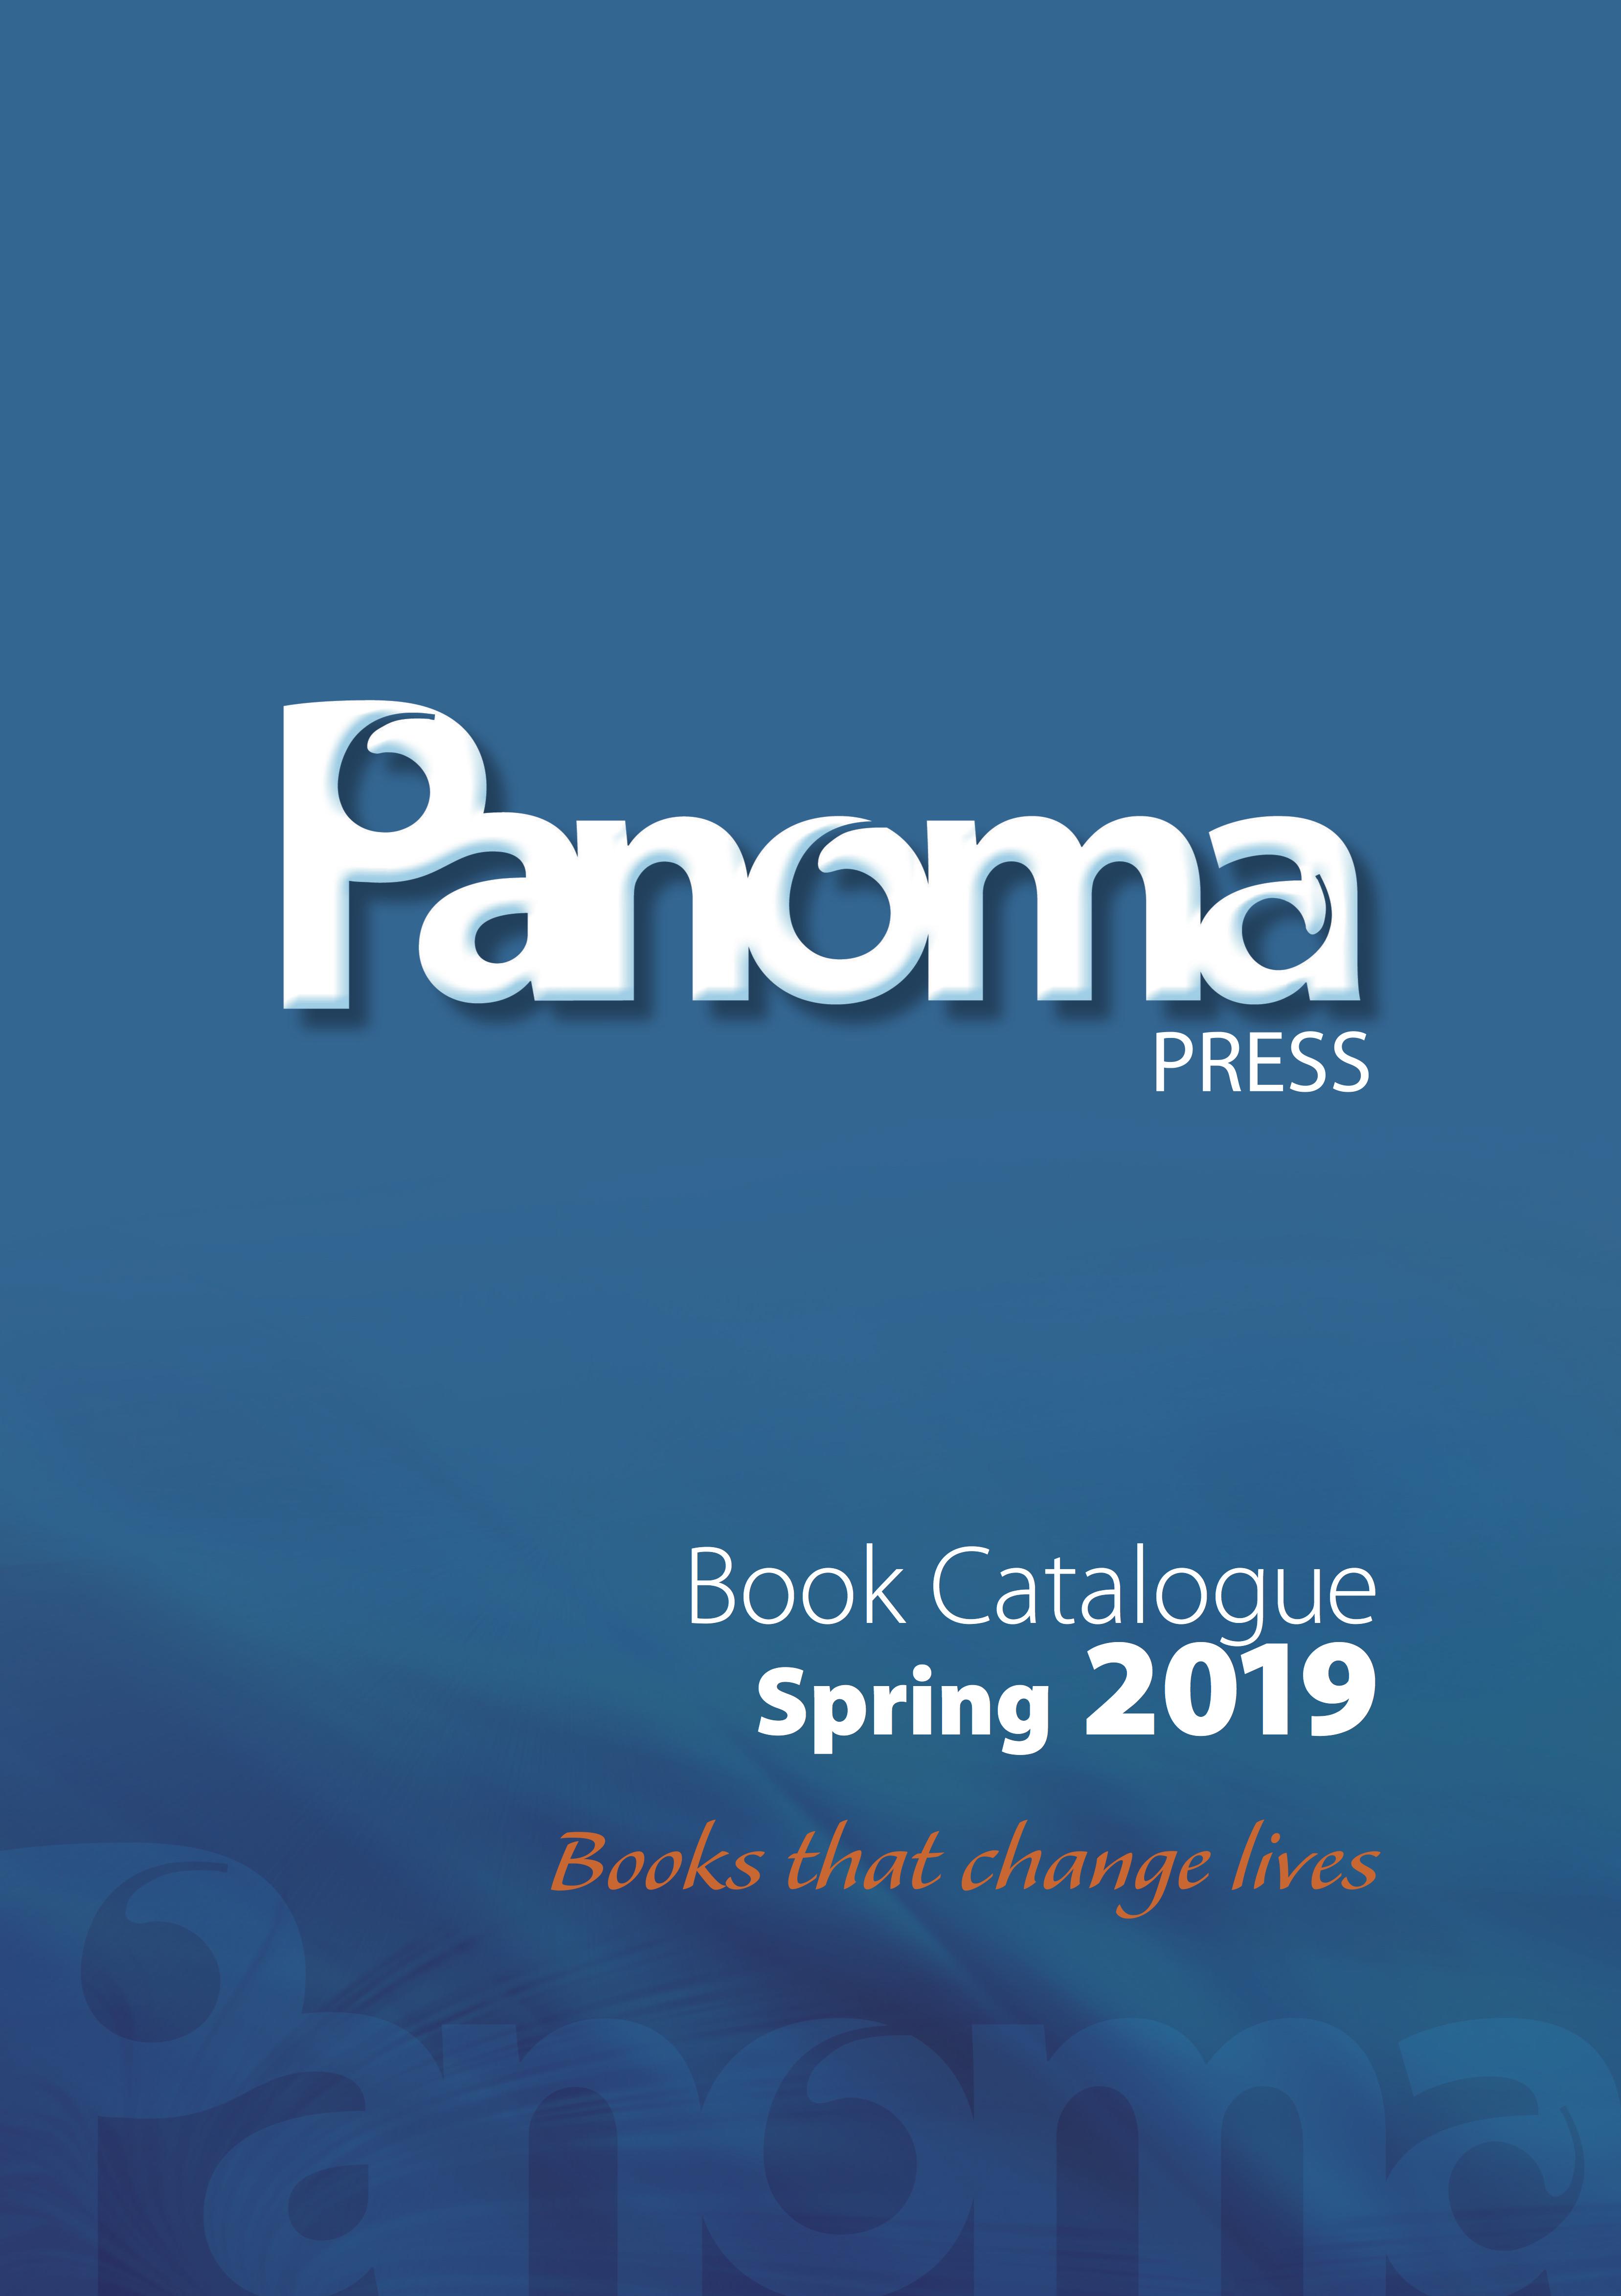 Panoma-Catalogue-2019